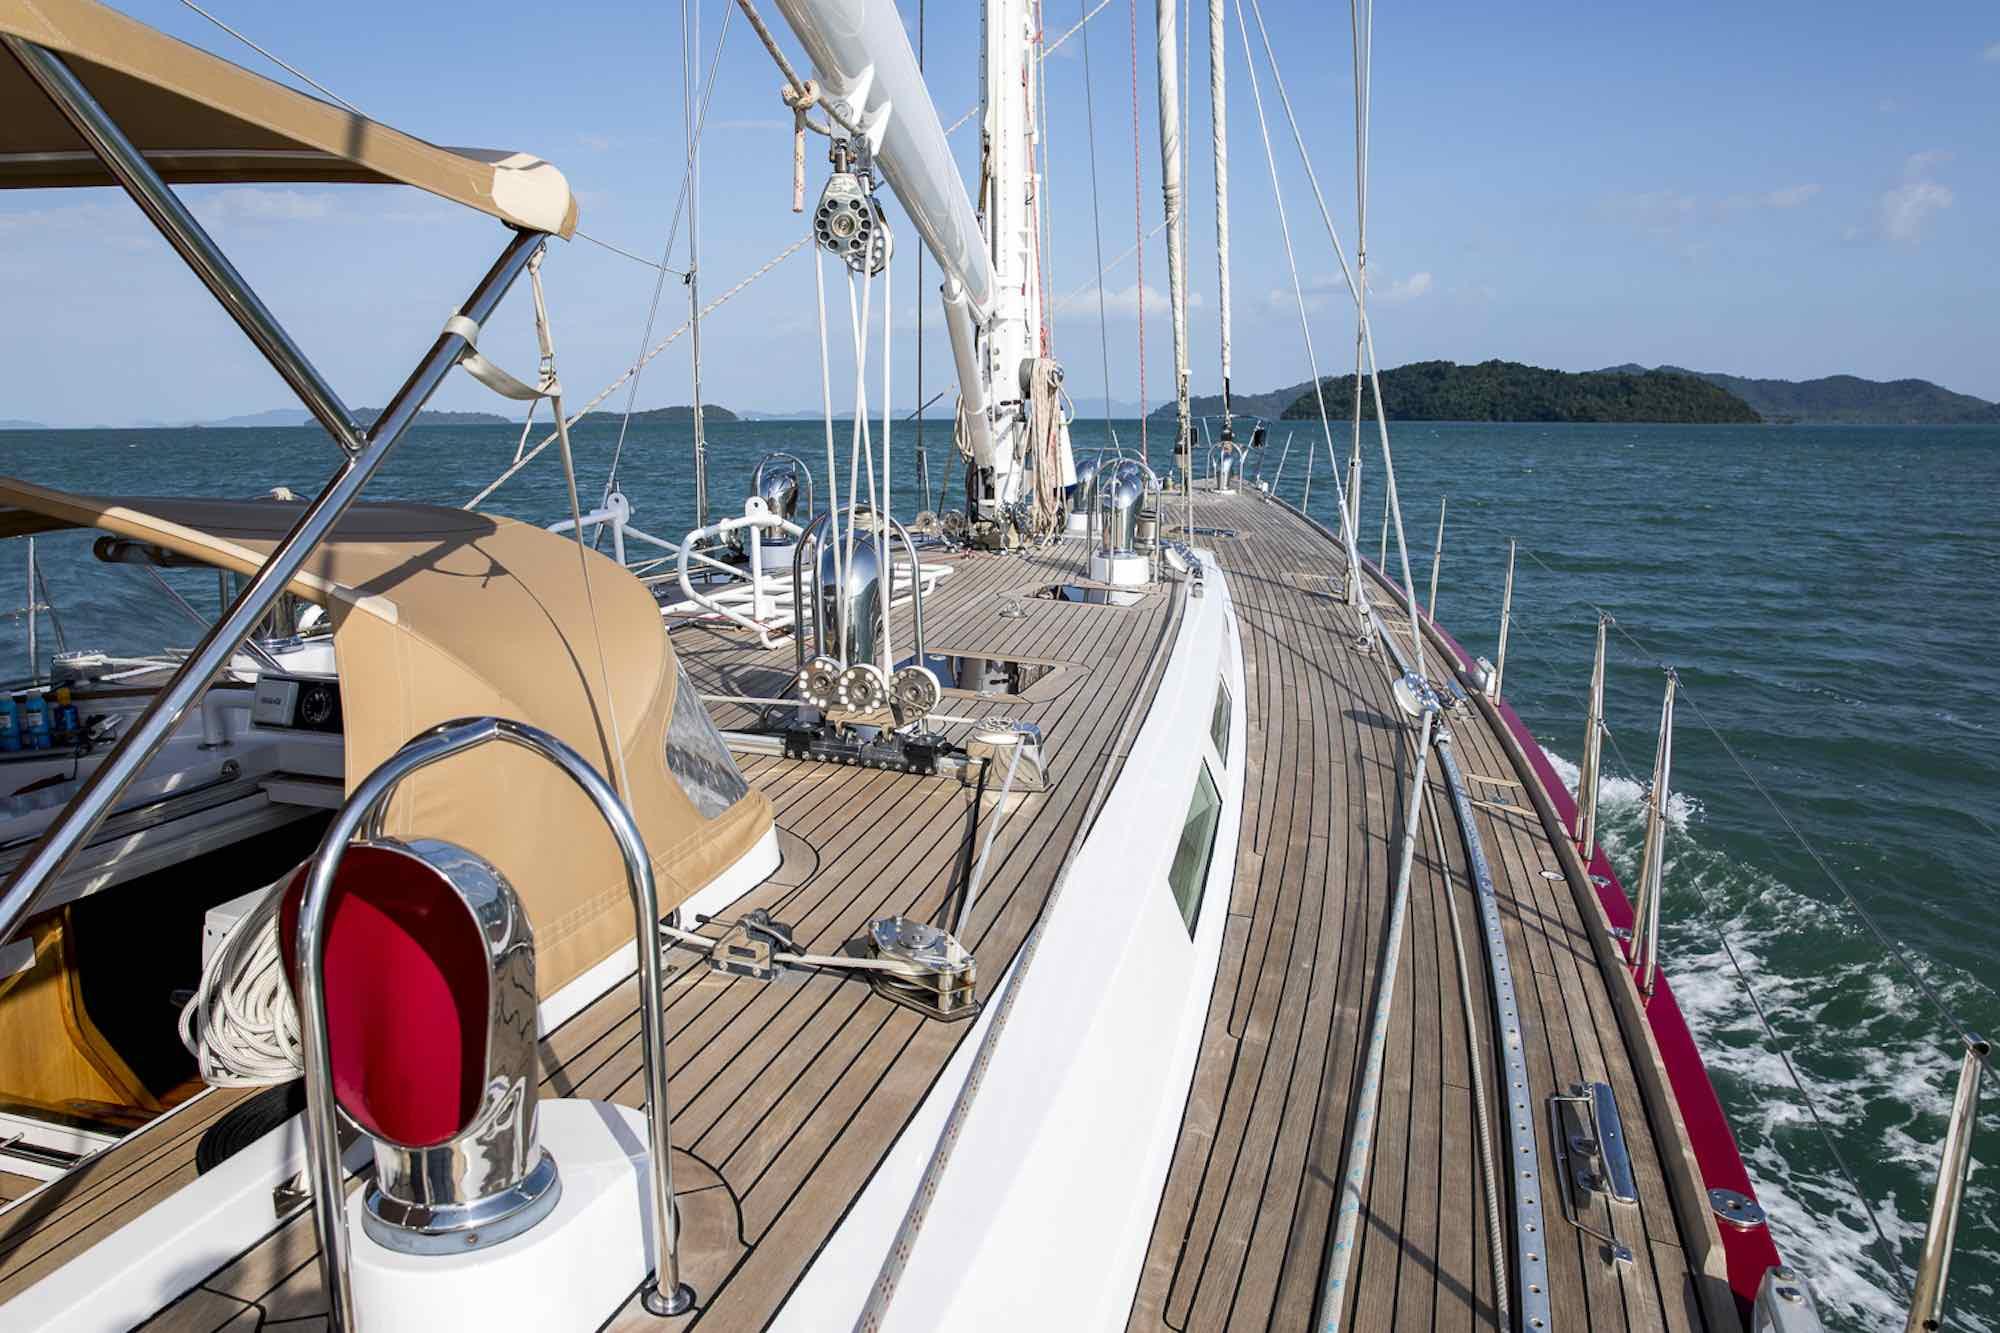 Aphrodite_promenade deck starboard sailing toward leafy islands_XS.jpeg